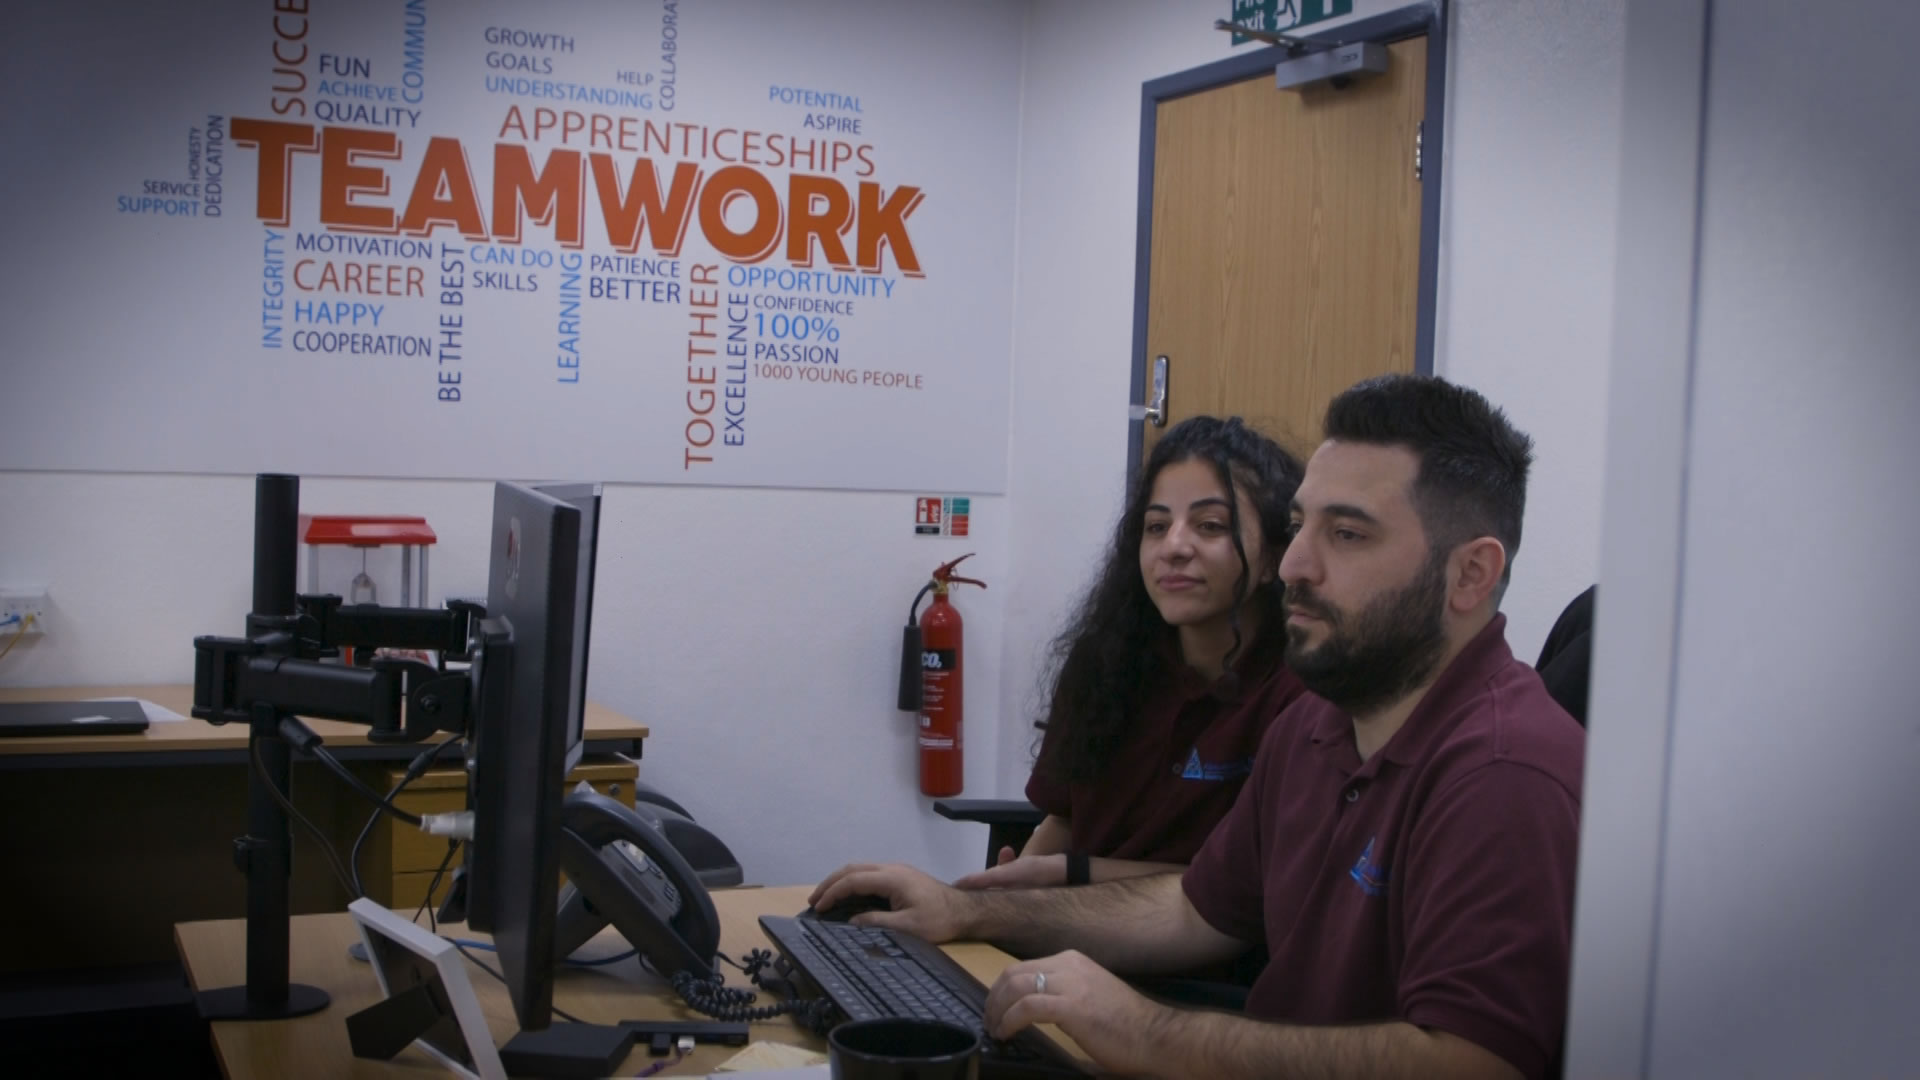 IT Technicians Working Next To Teamwork Sign